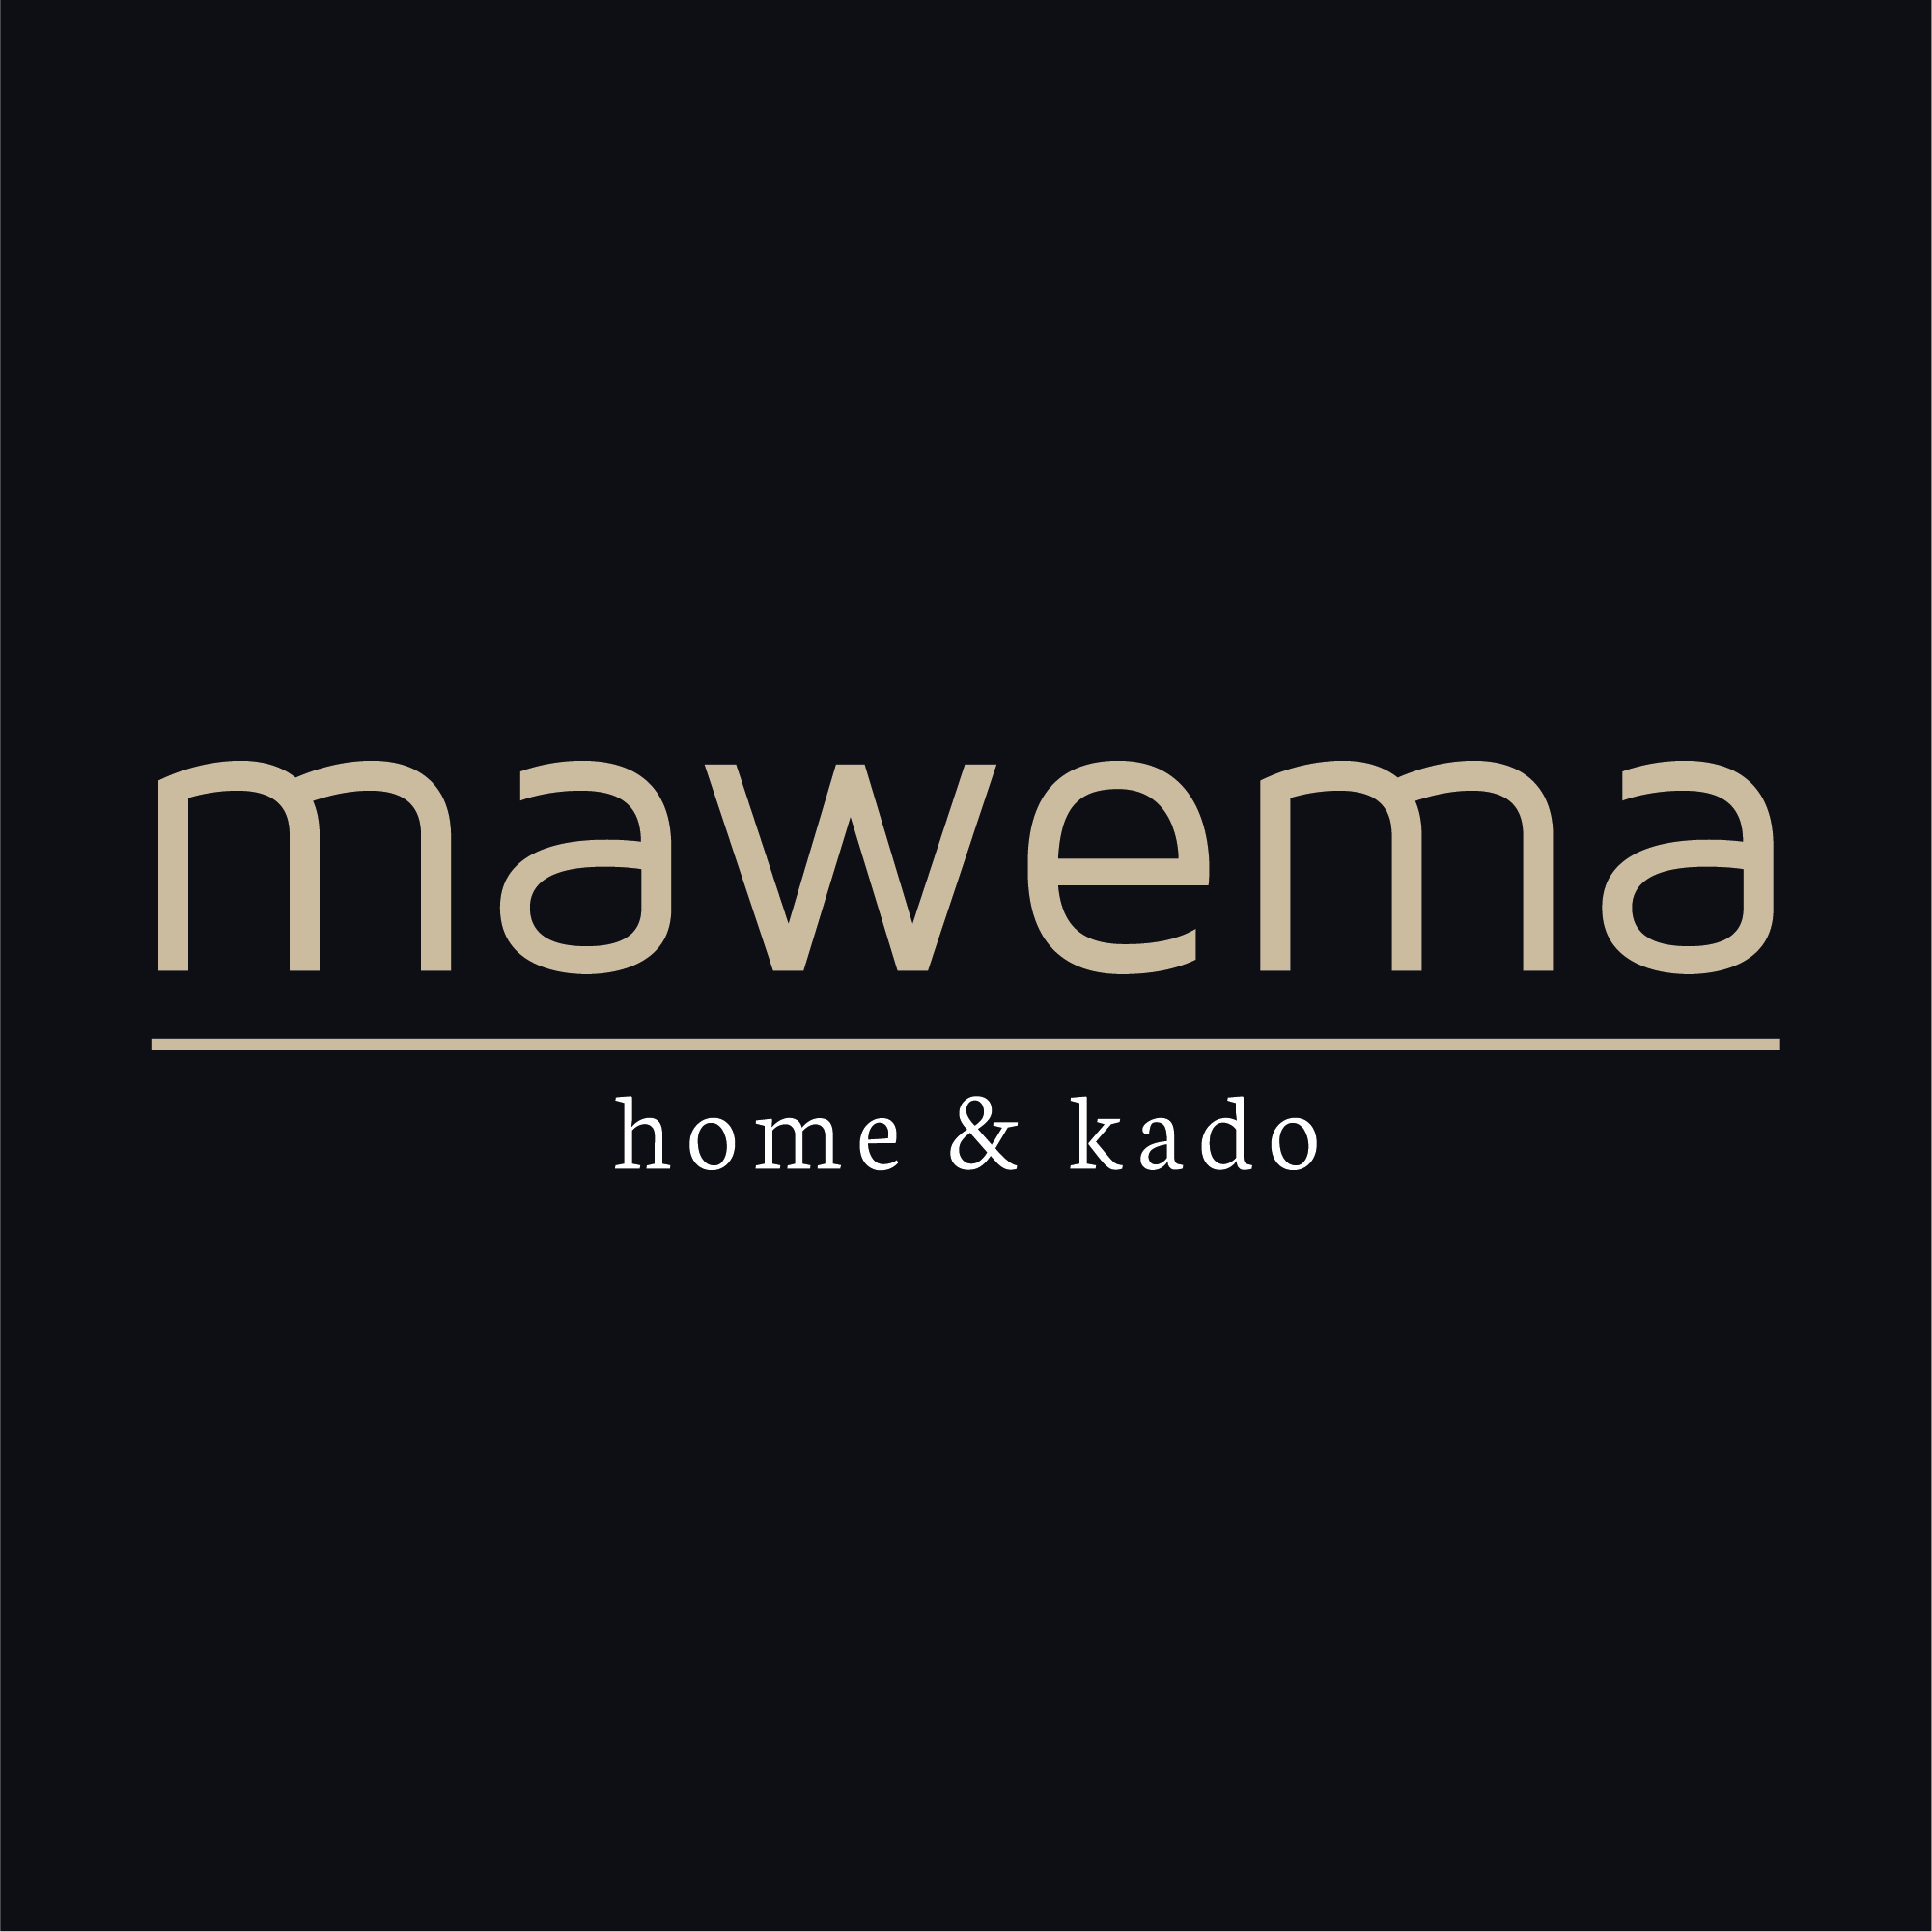 Mawema